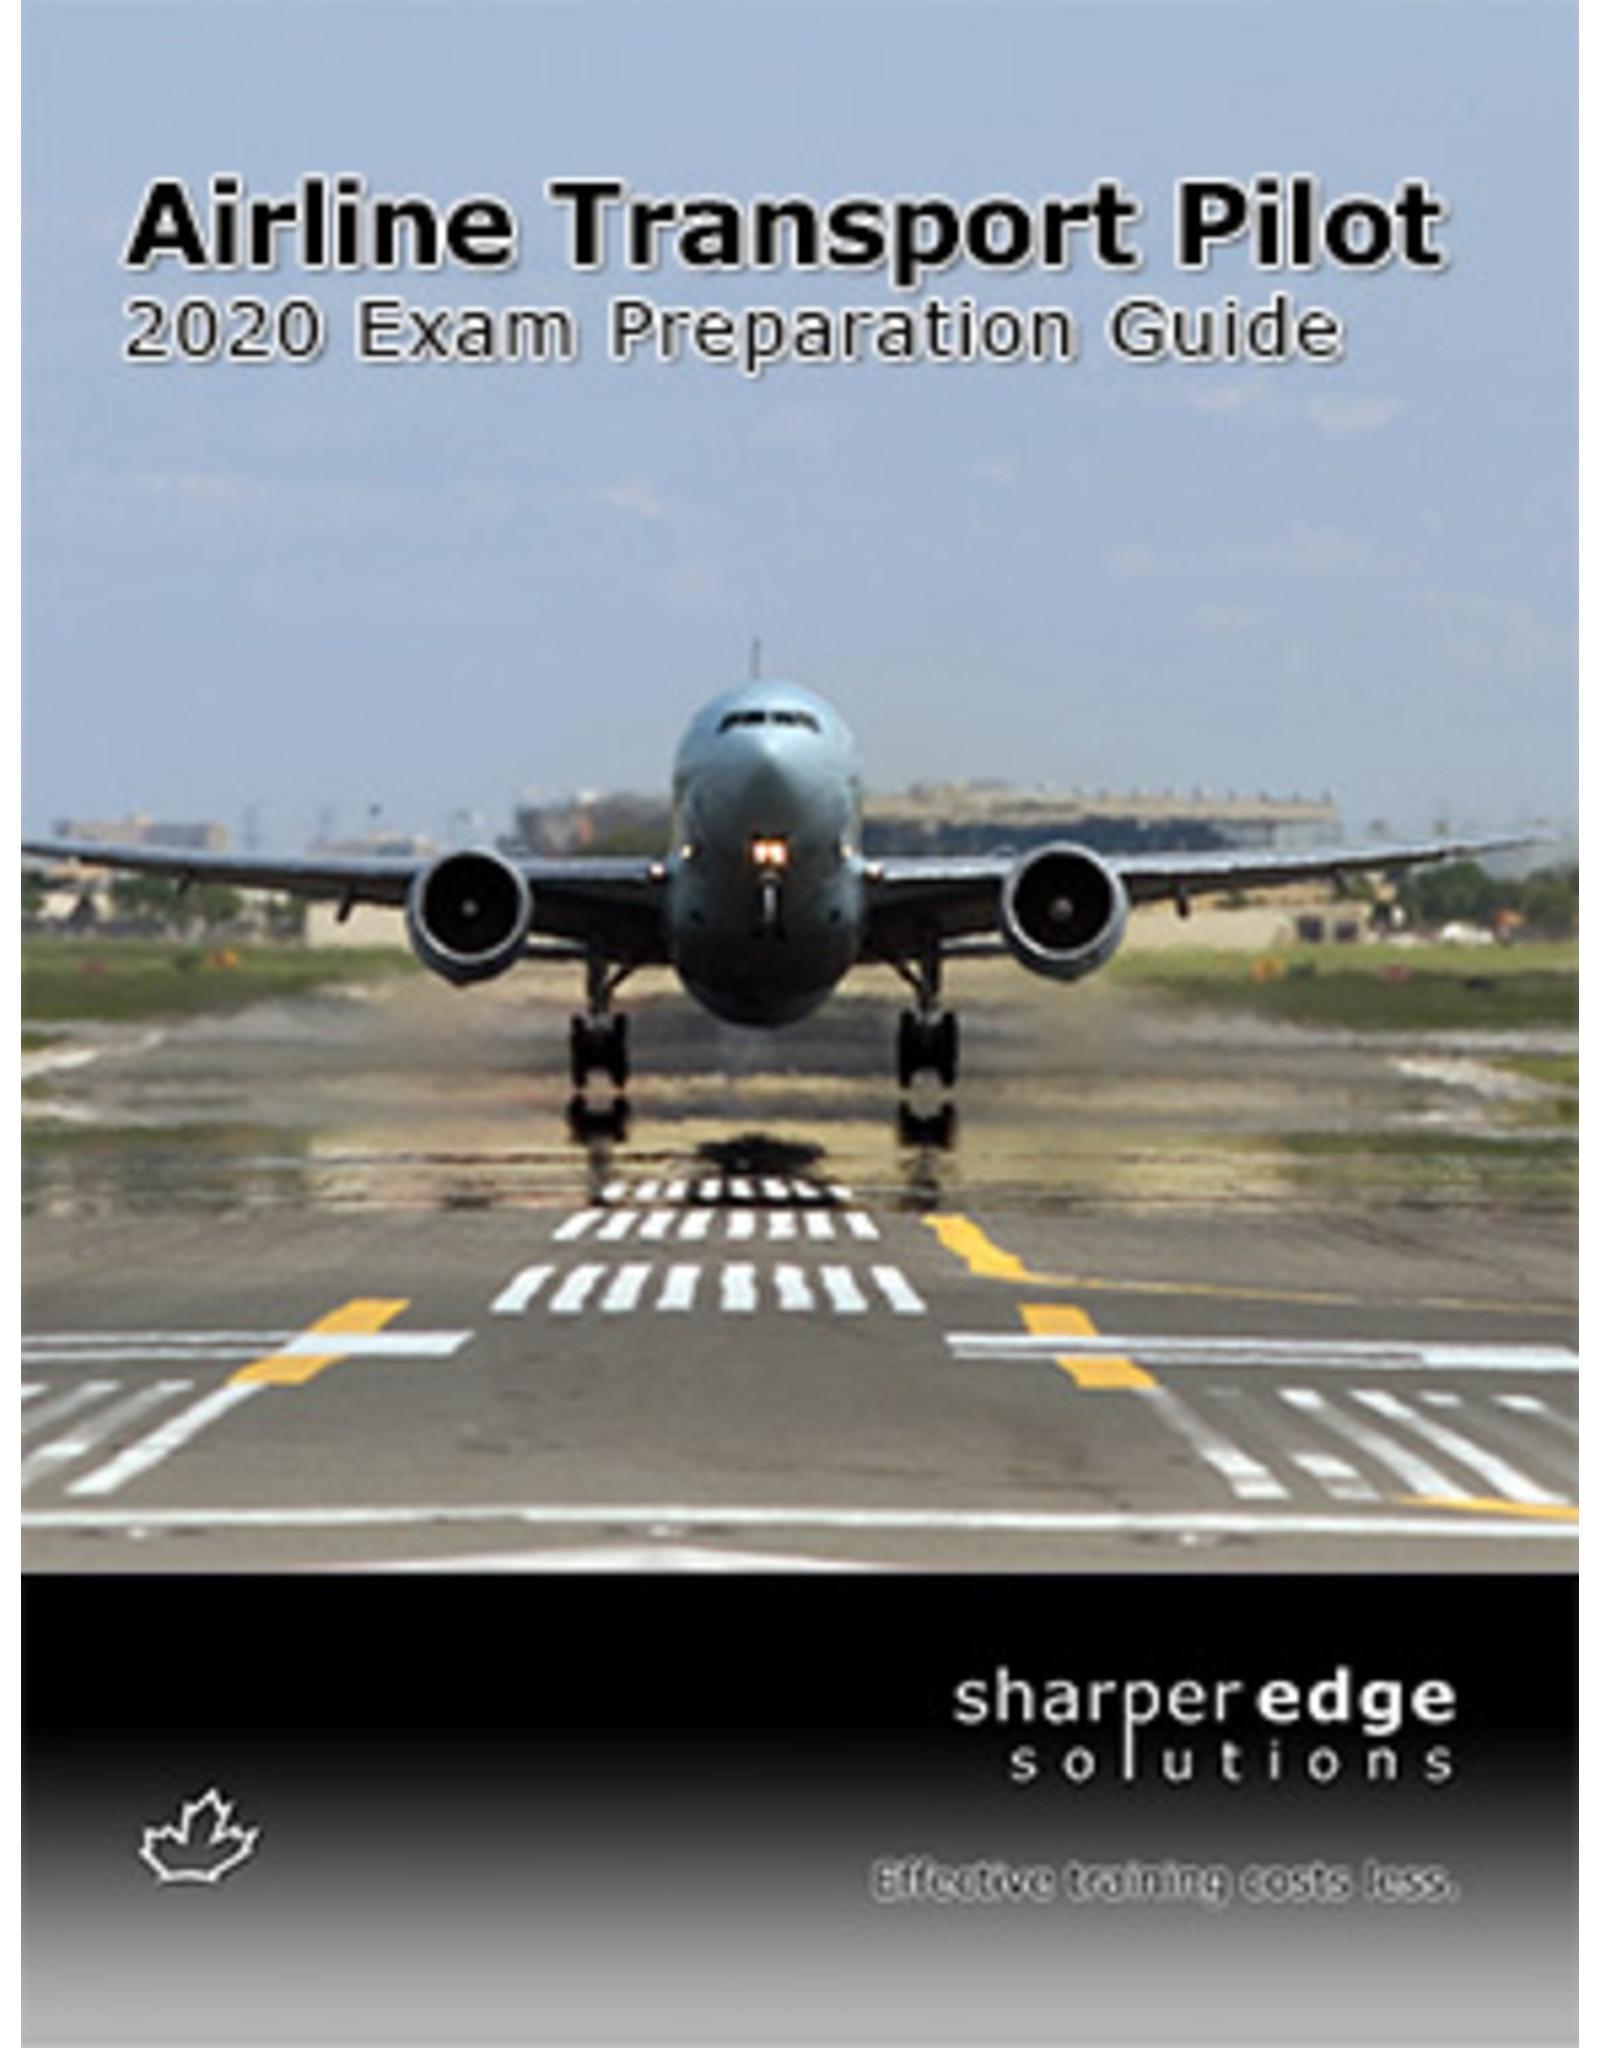 Sharper Edge ATPL Prep 2020